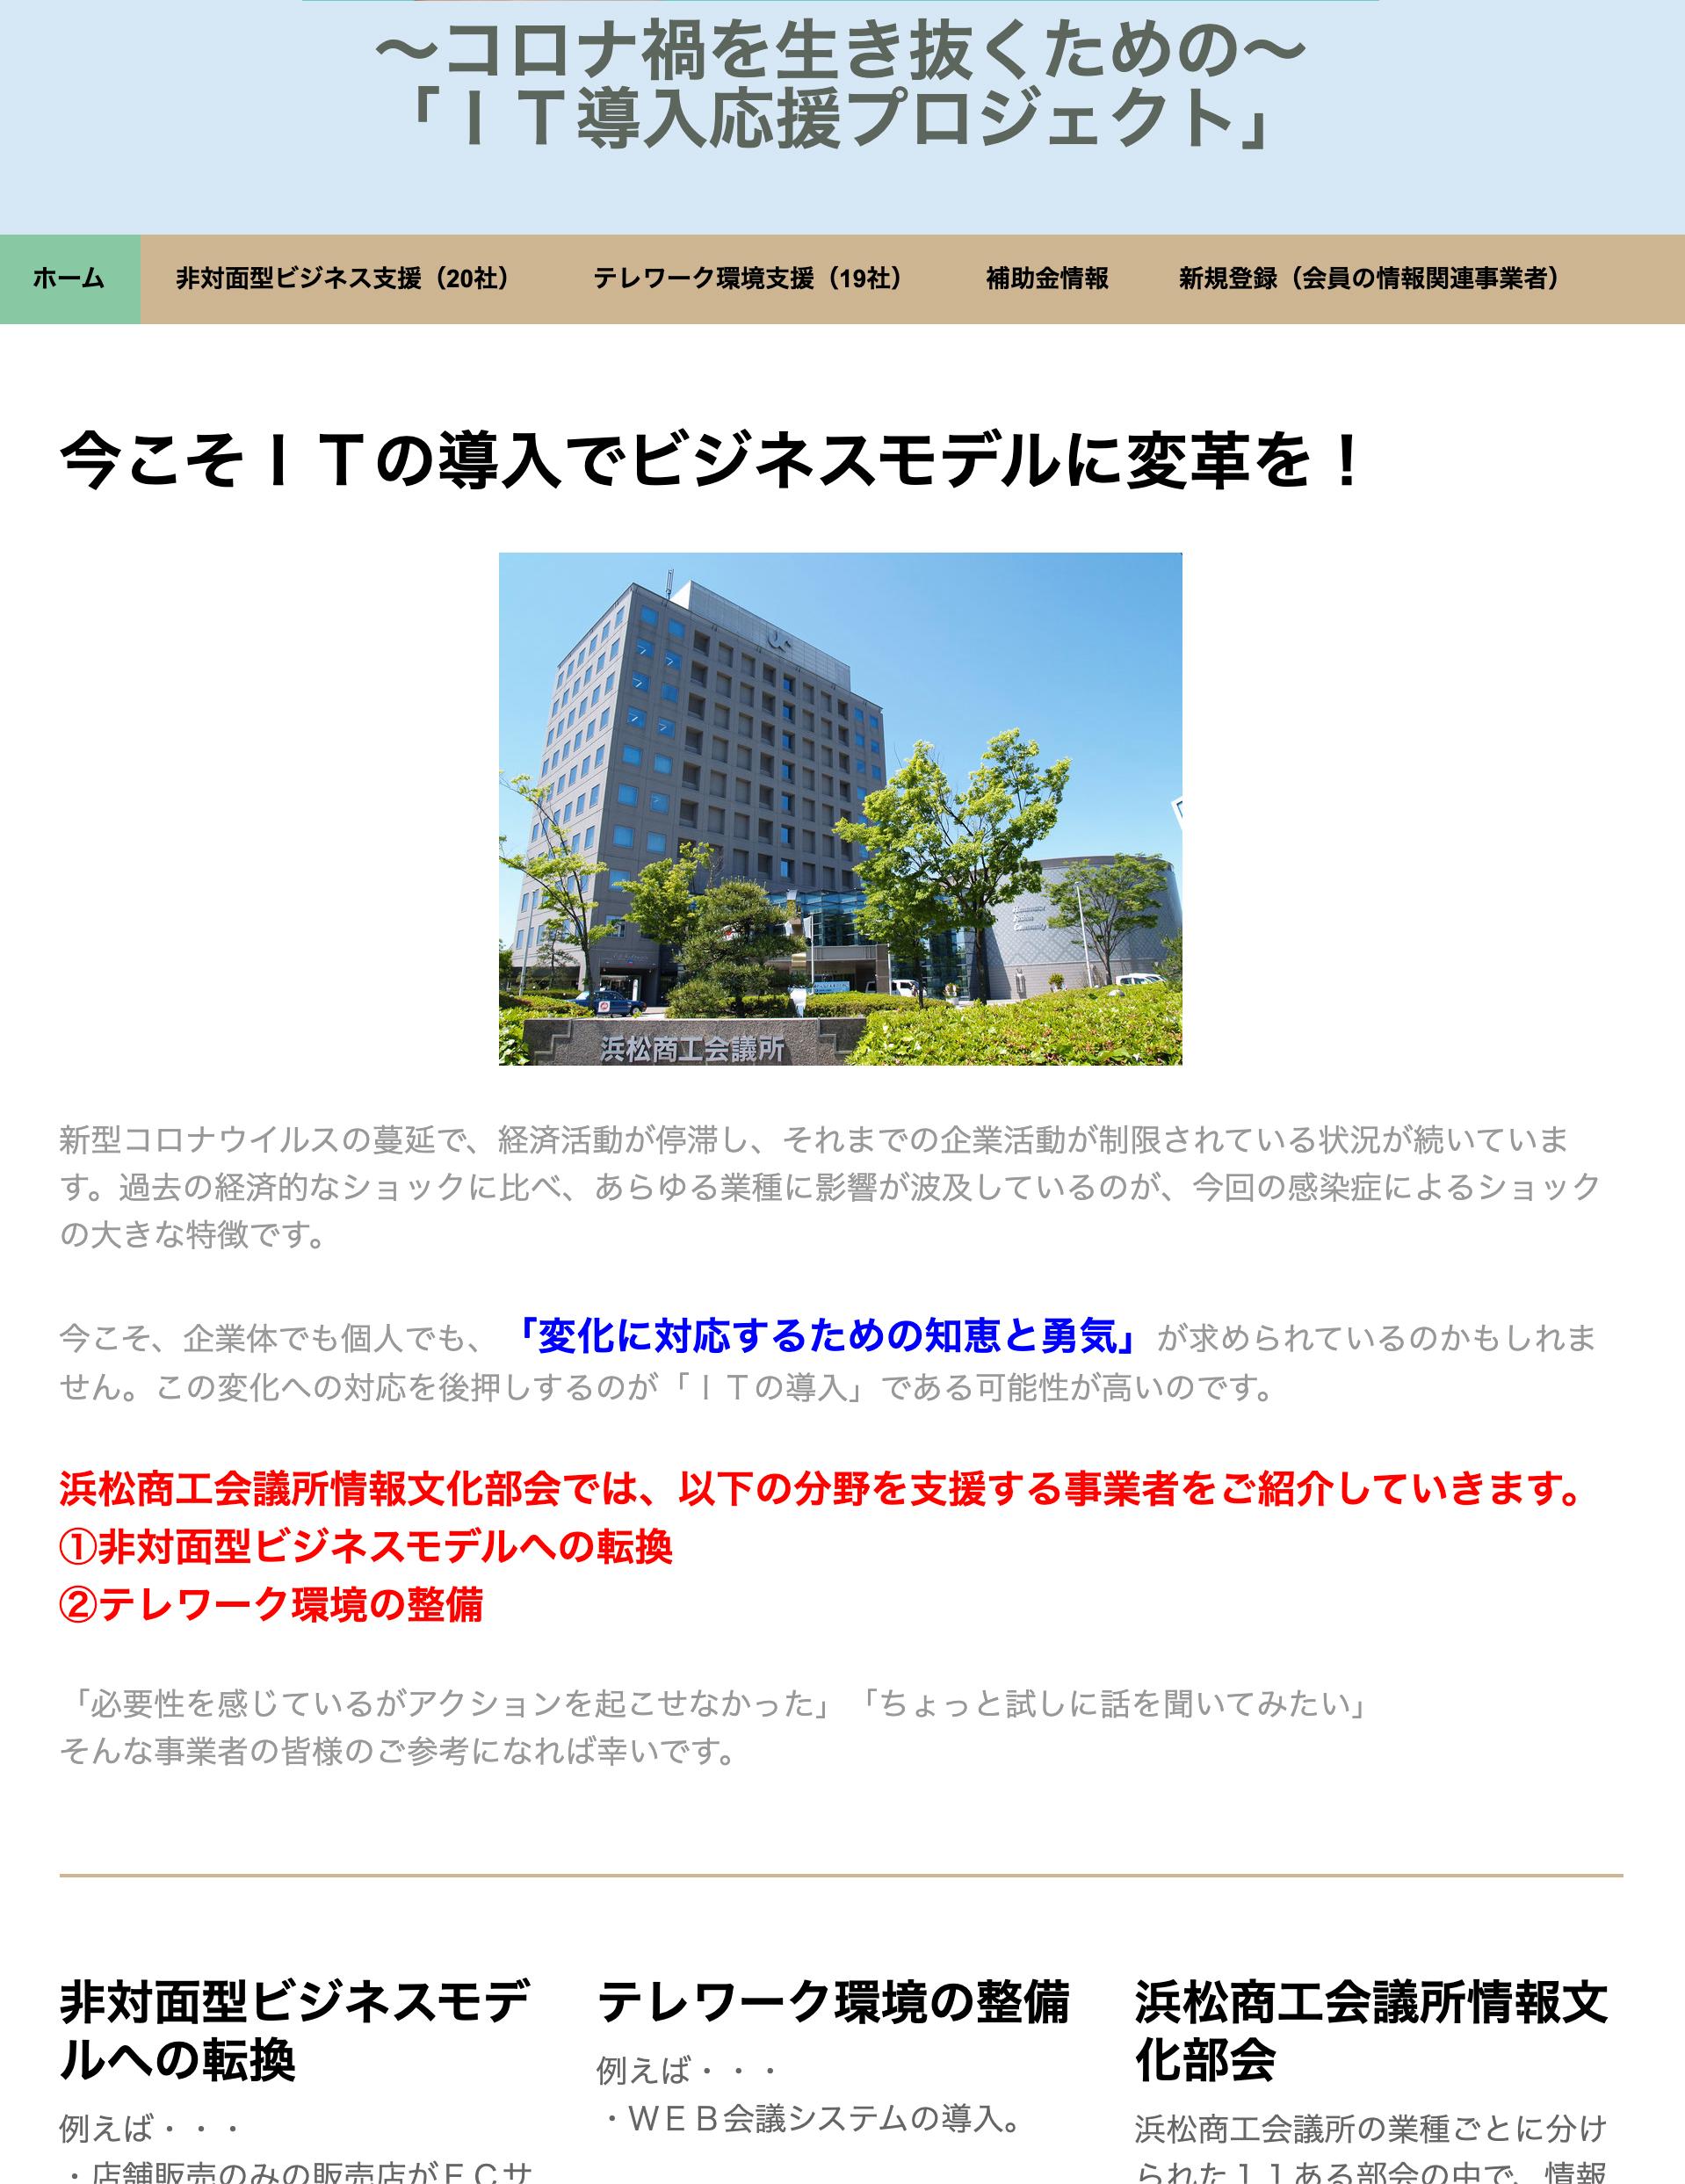 浜松商工会議所情報文化部会様主催「IT導入応援プロジェクト」